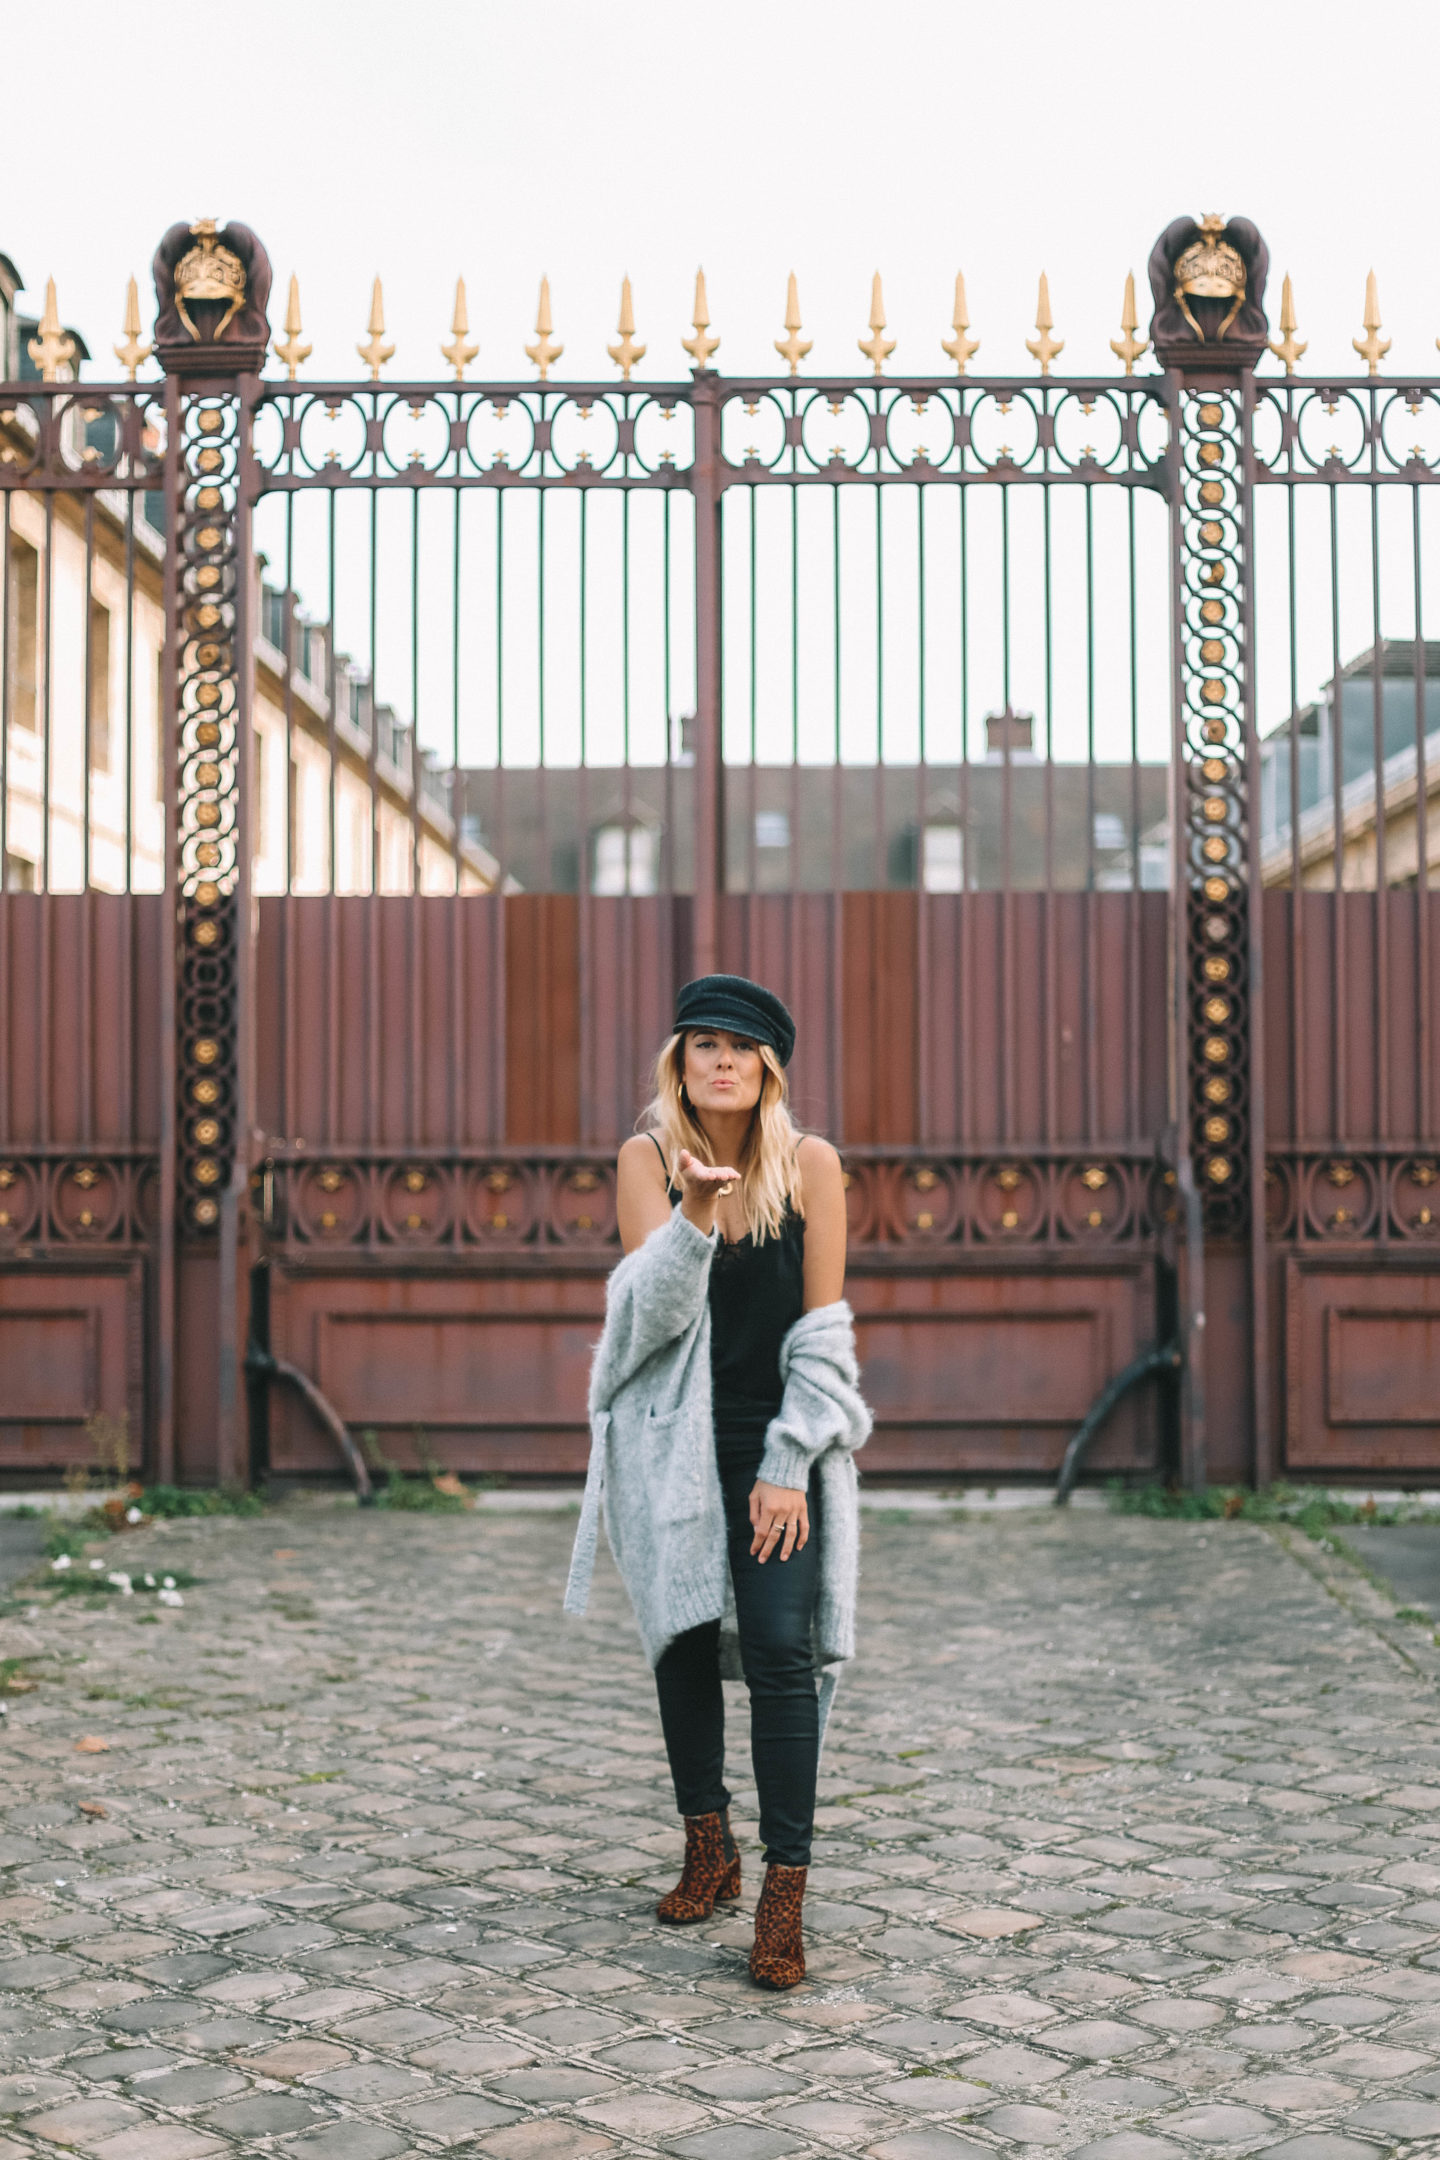 Boots léopard Boden - Blondie baby blog mode et voyages